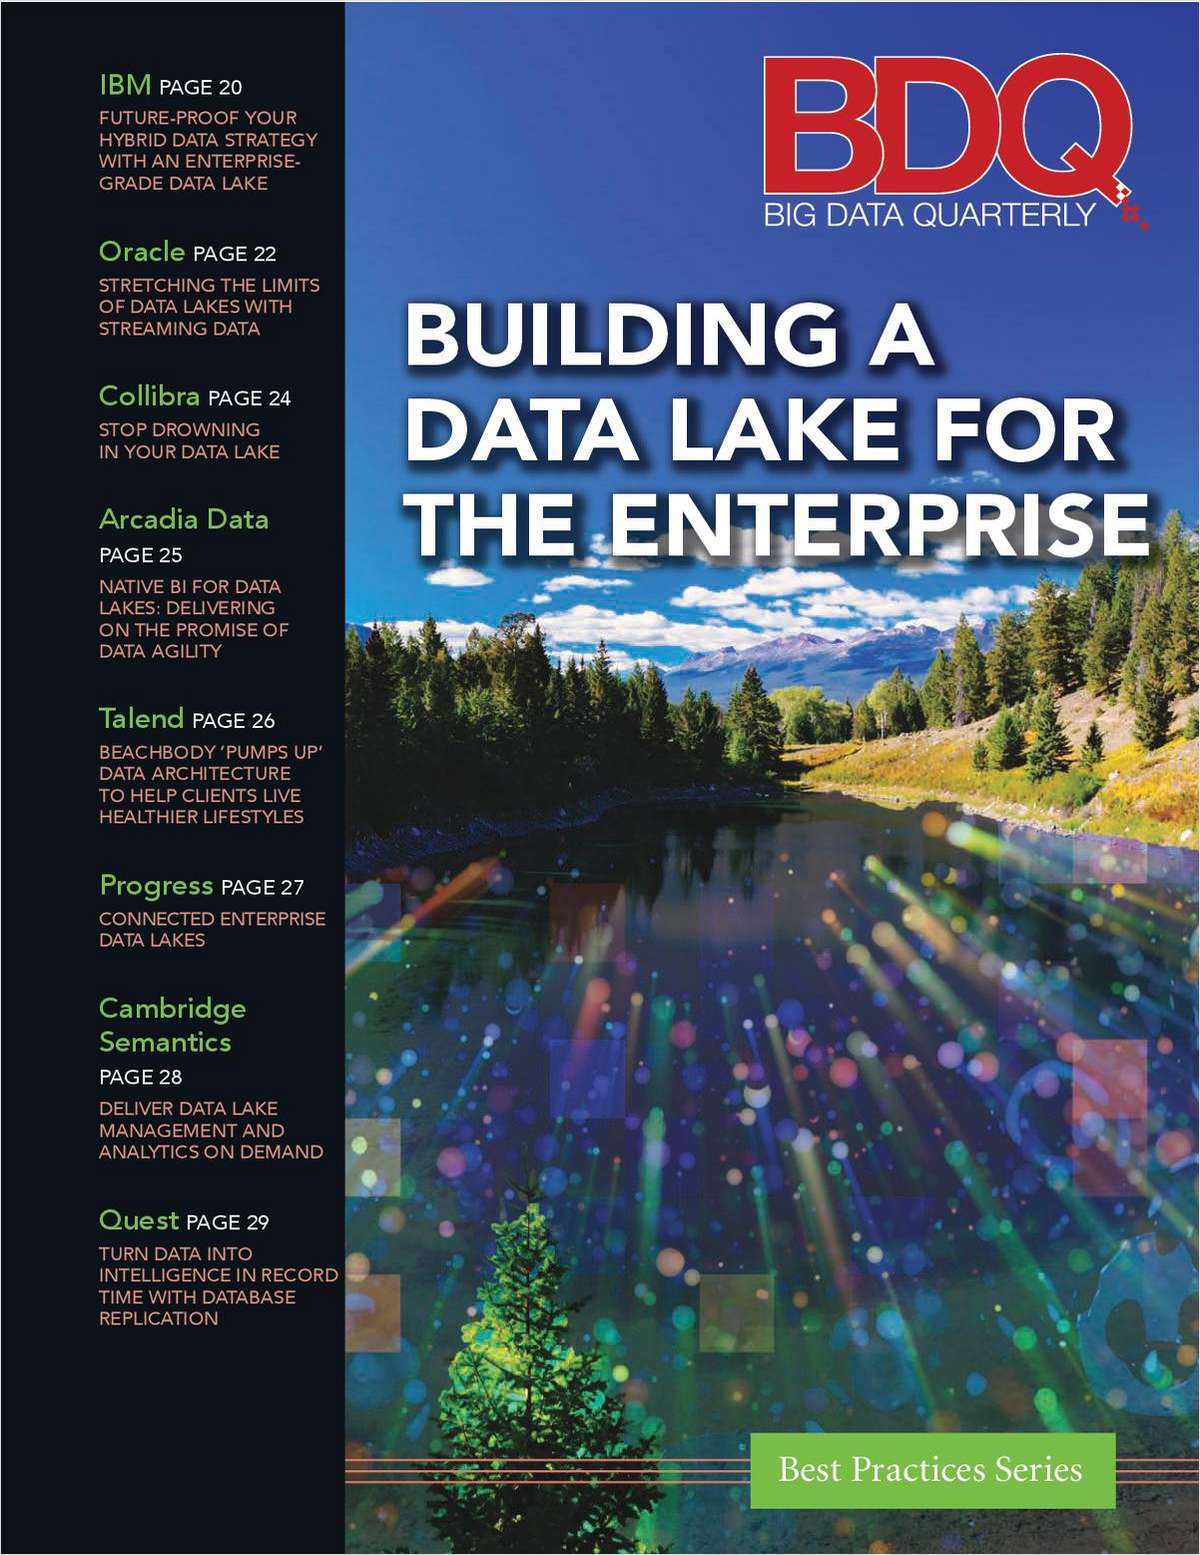 Building a Data Lake for the Enterprise